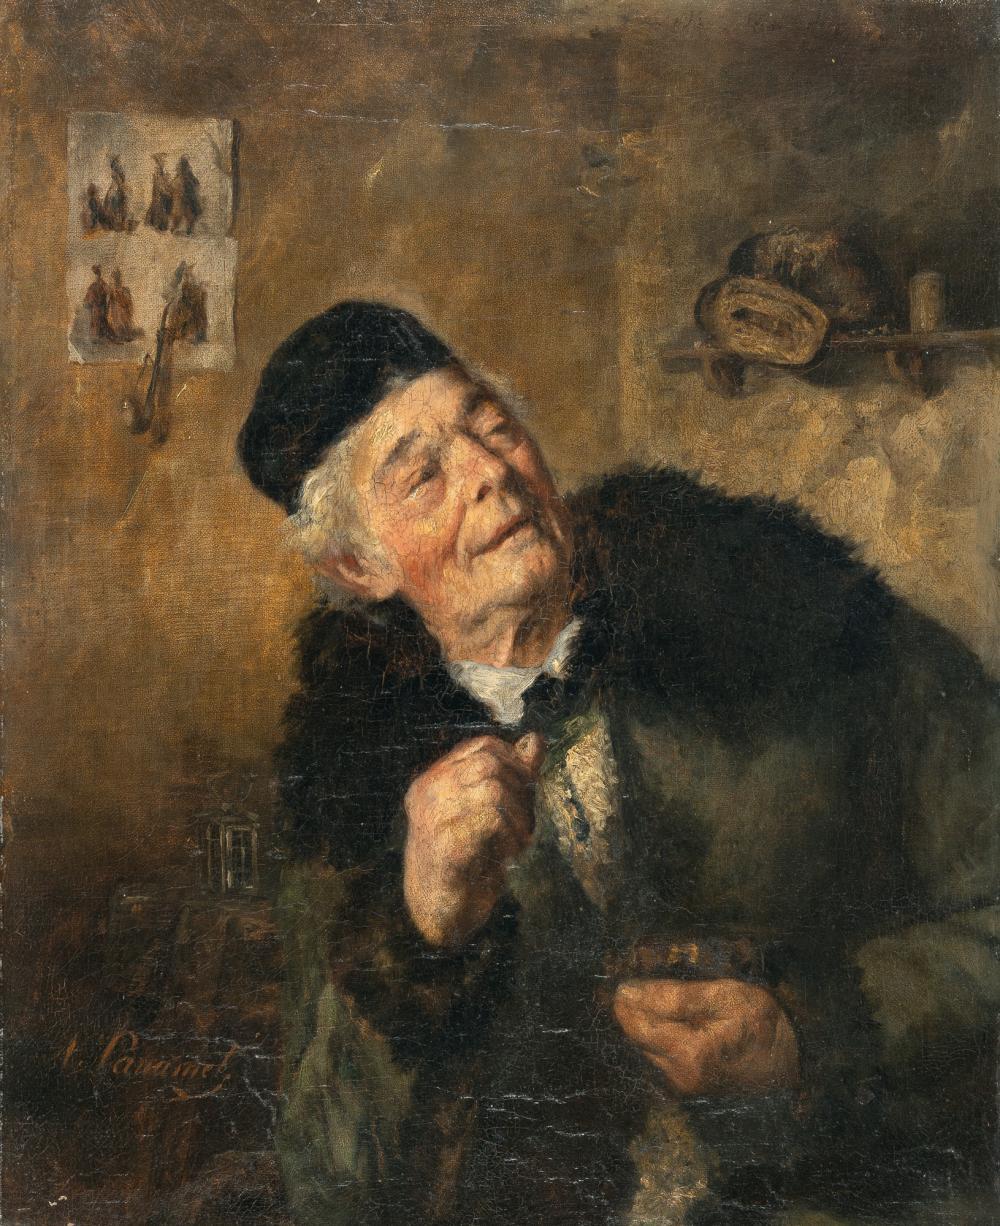 Honoré Daumier (Umkreis) – Der Kunstkenner